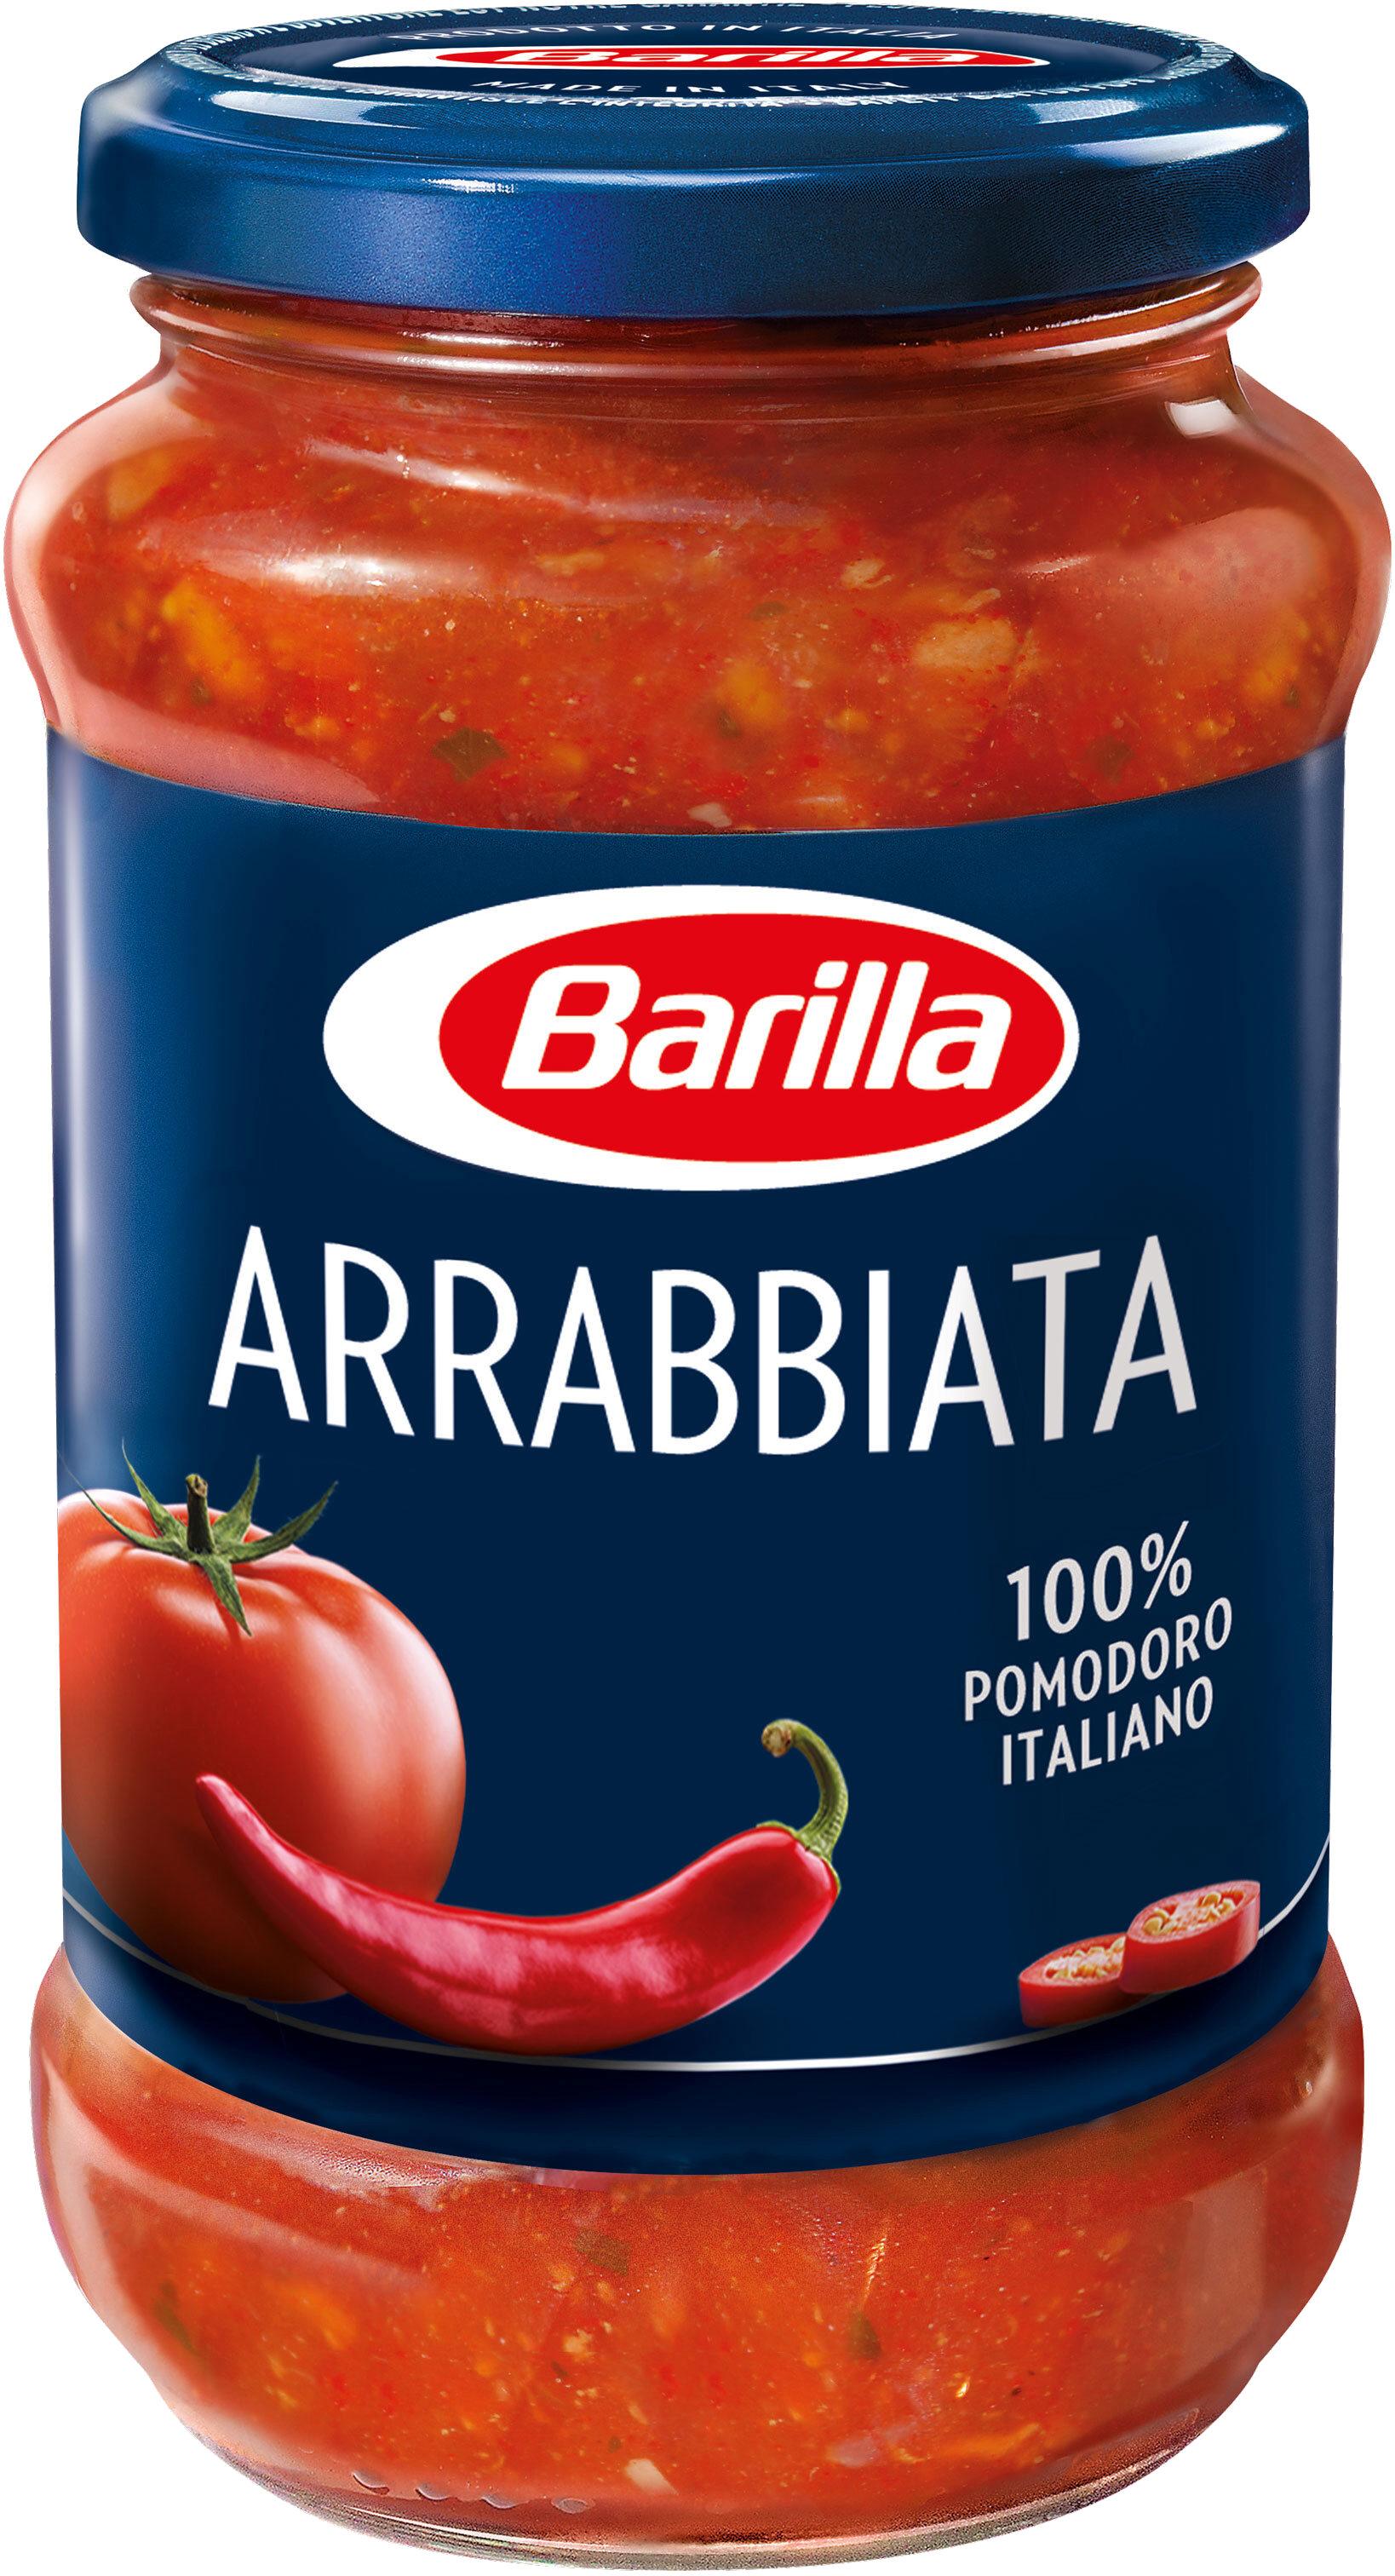 Barilla sauce tomates arrabbiata - Tuote - fi